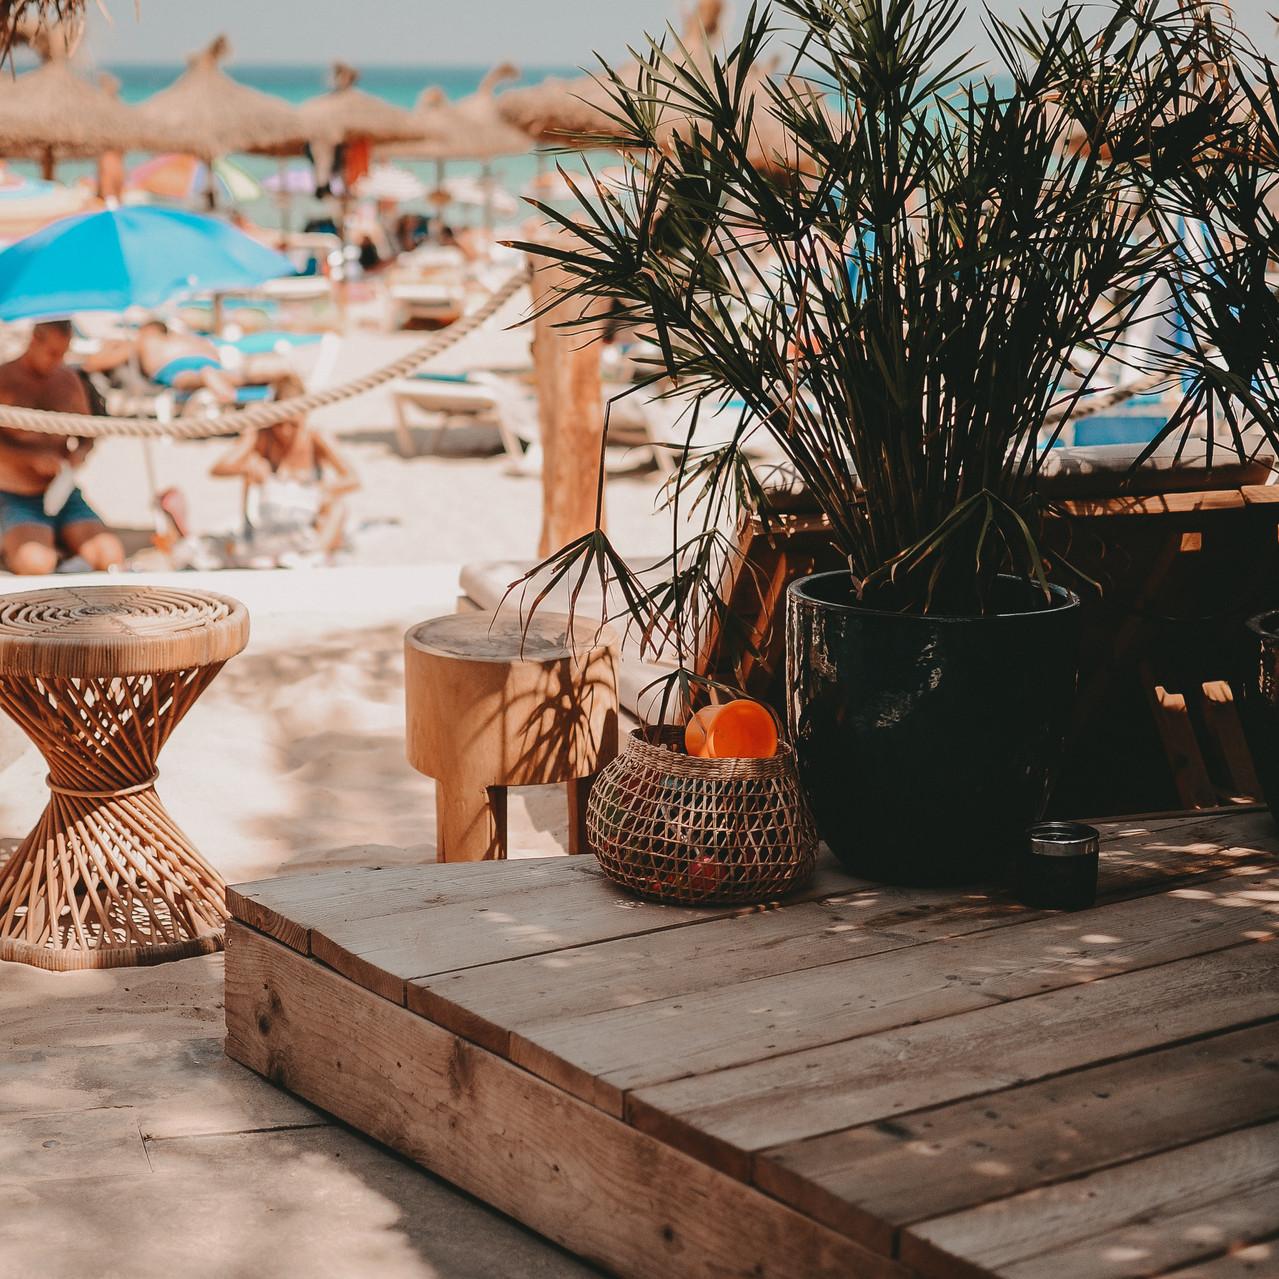 Coco Beachhouse in Cala Ratjada